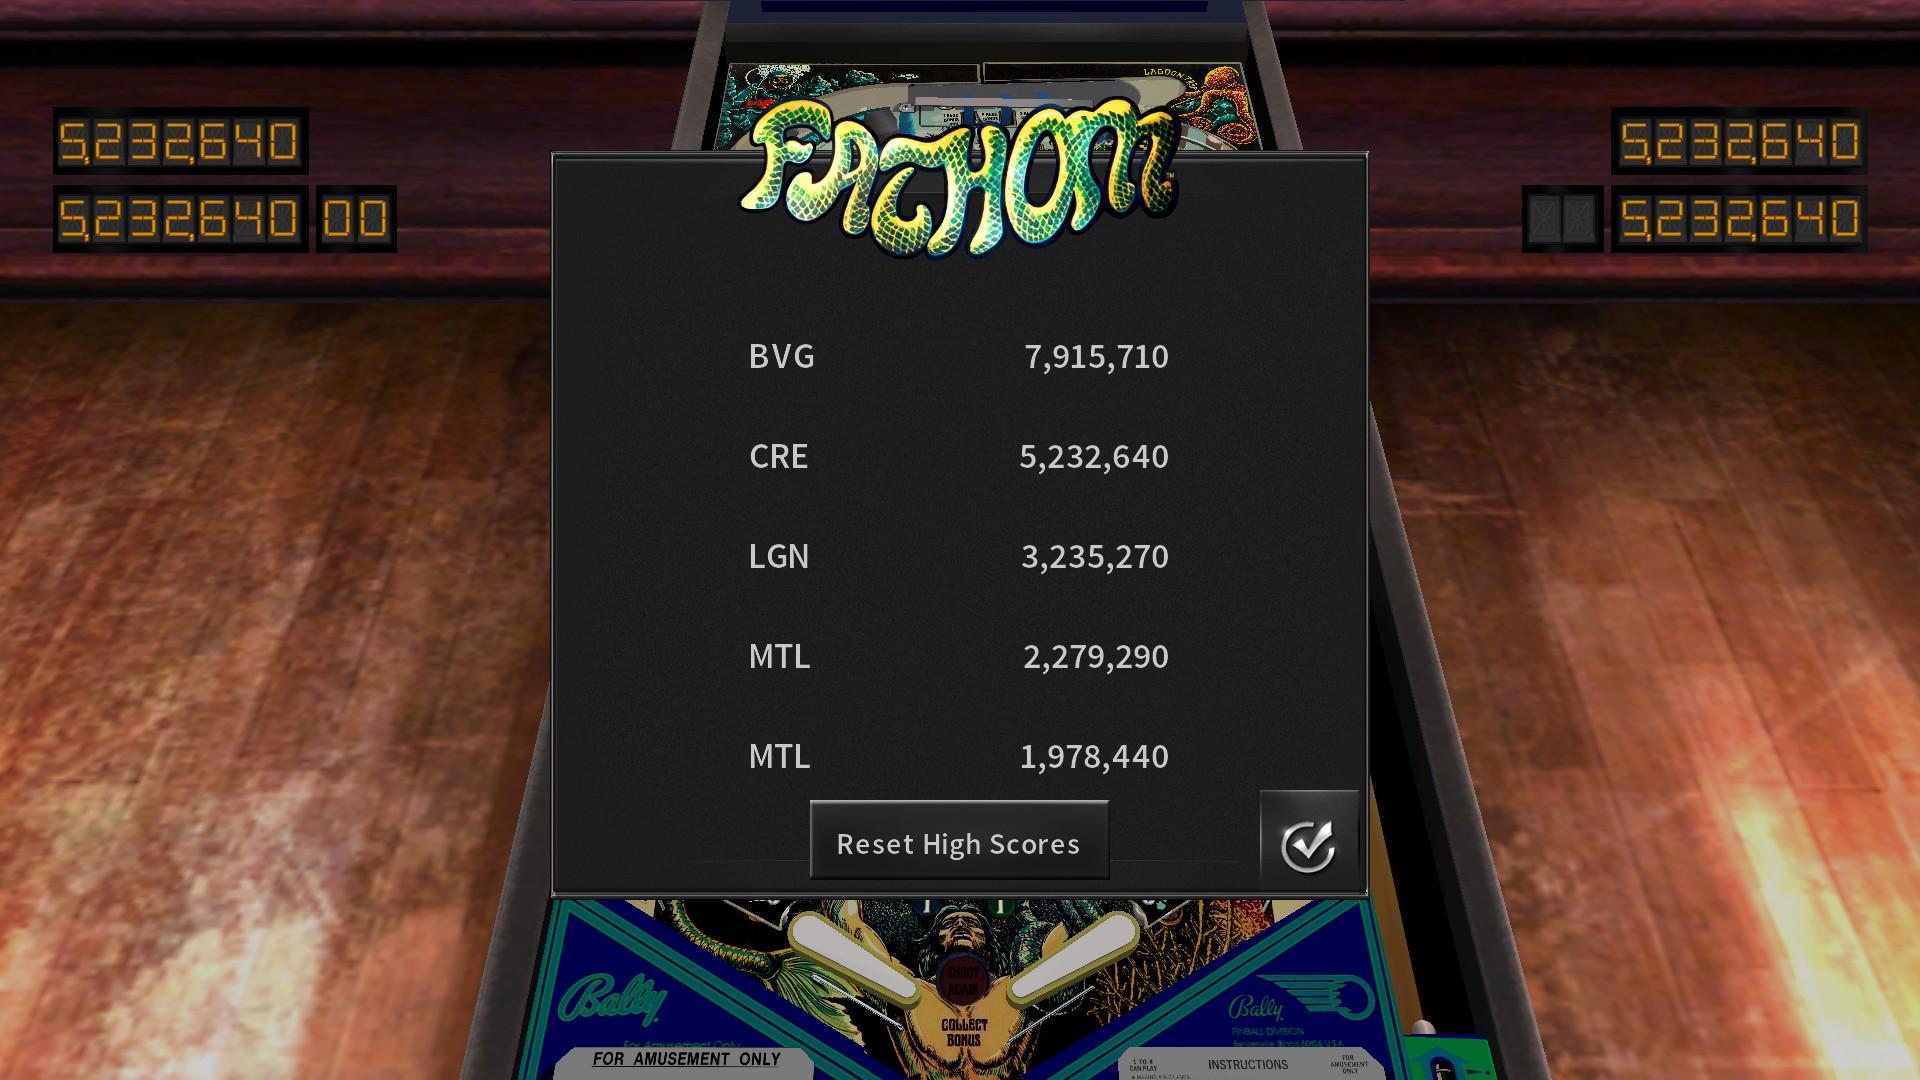 Mantalow: Pinball Arcade: Fathom (PC) 2,279,290 points on 2018-01-16 03:01:55